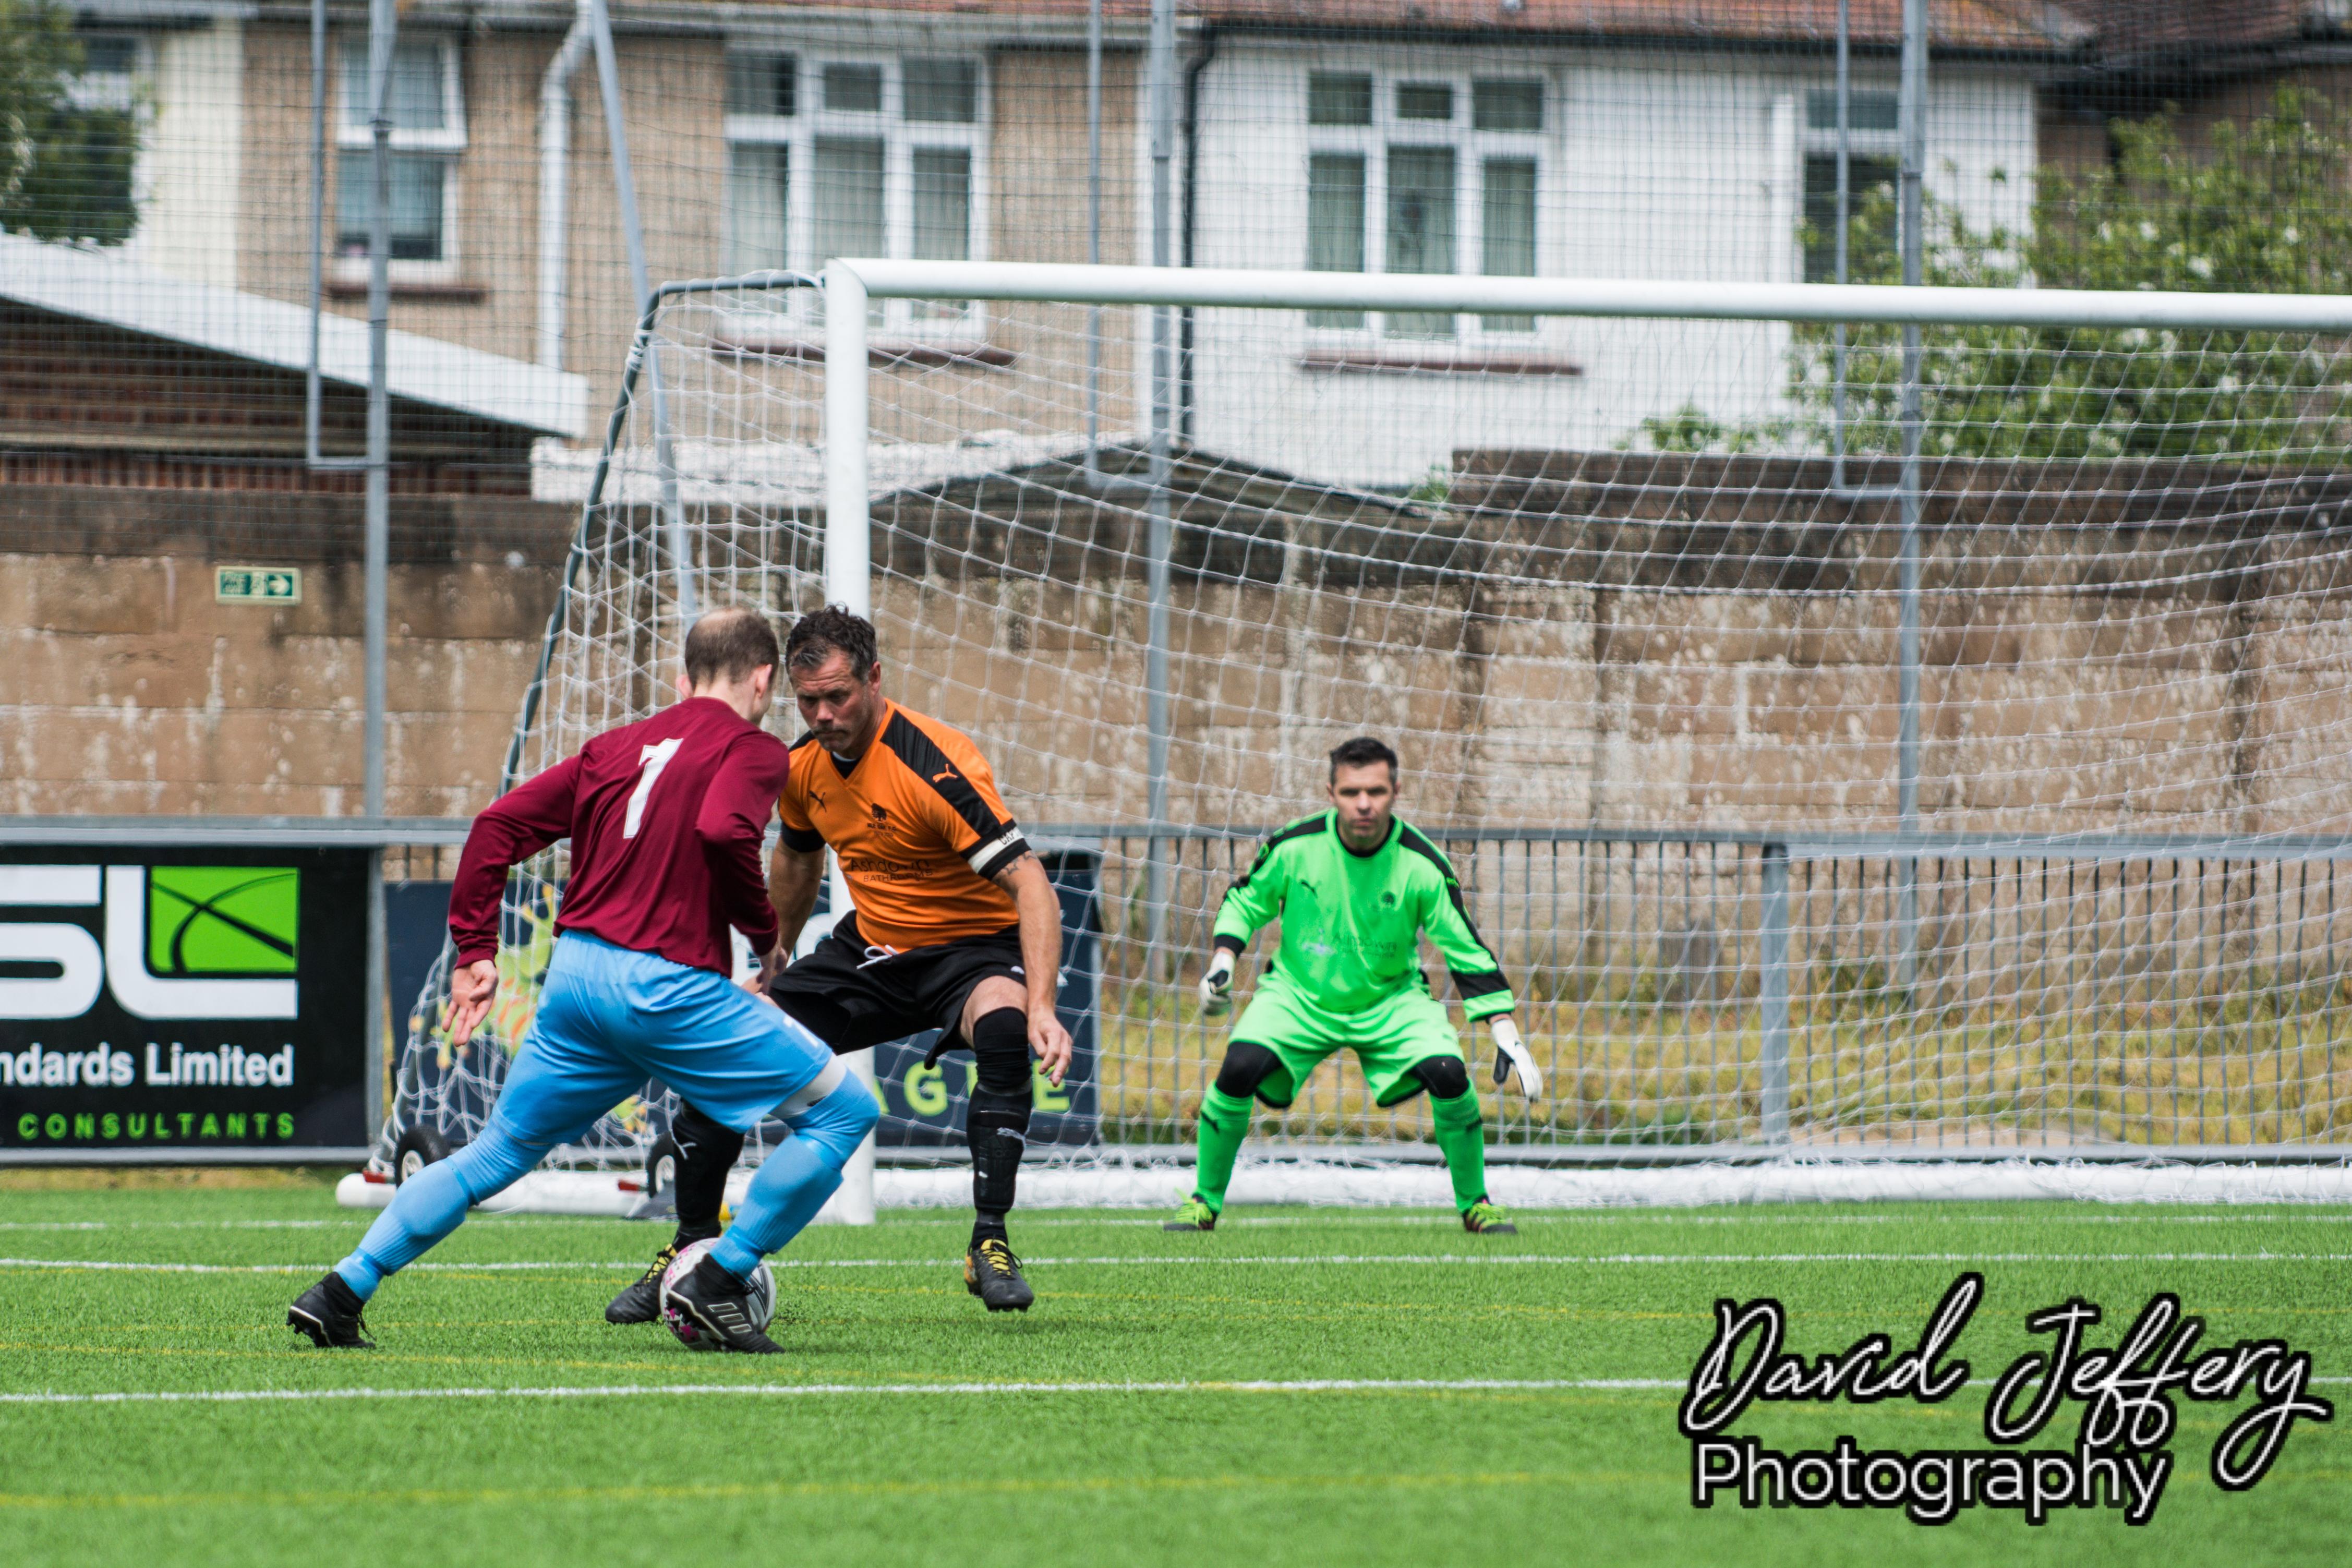 053 MOFC Vets vs Horl Vets 05.05